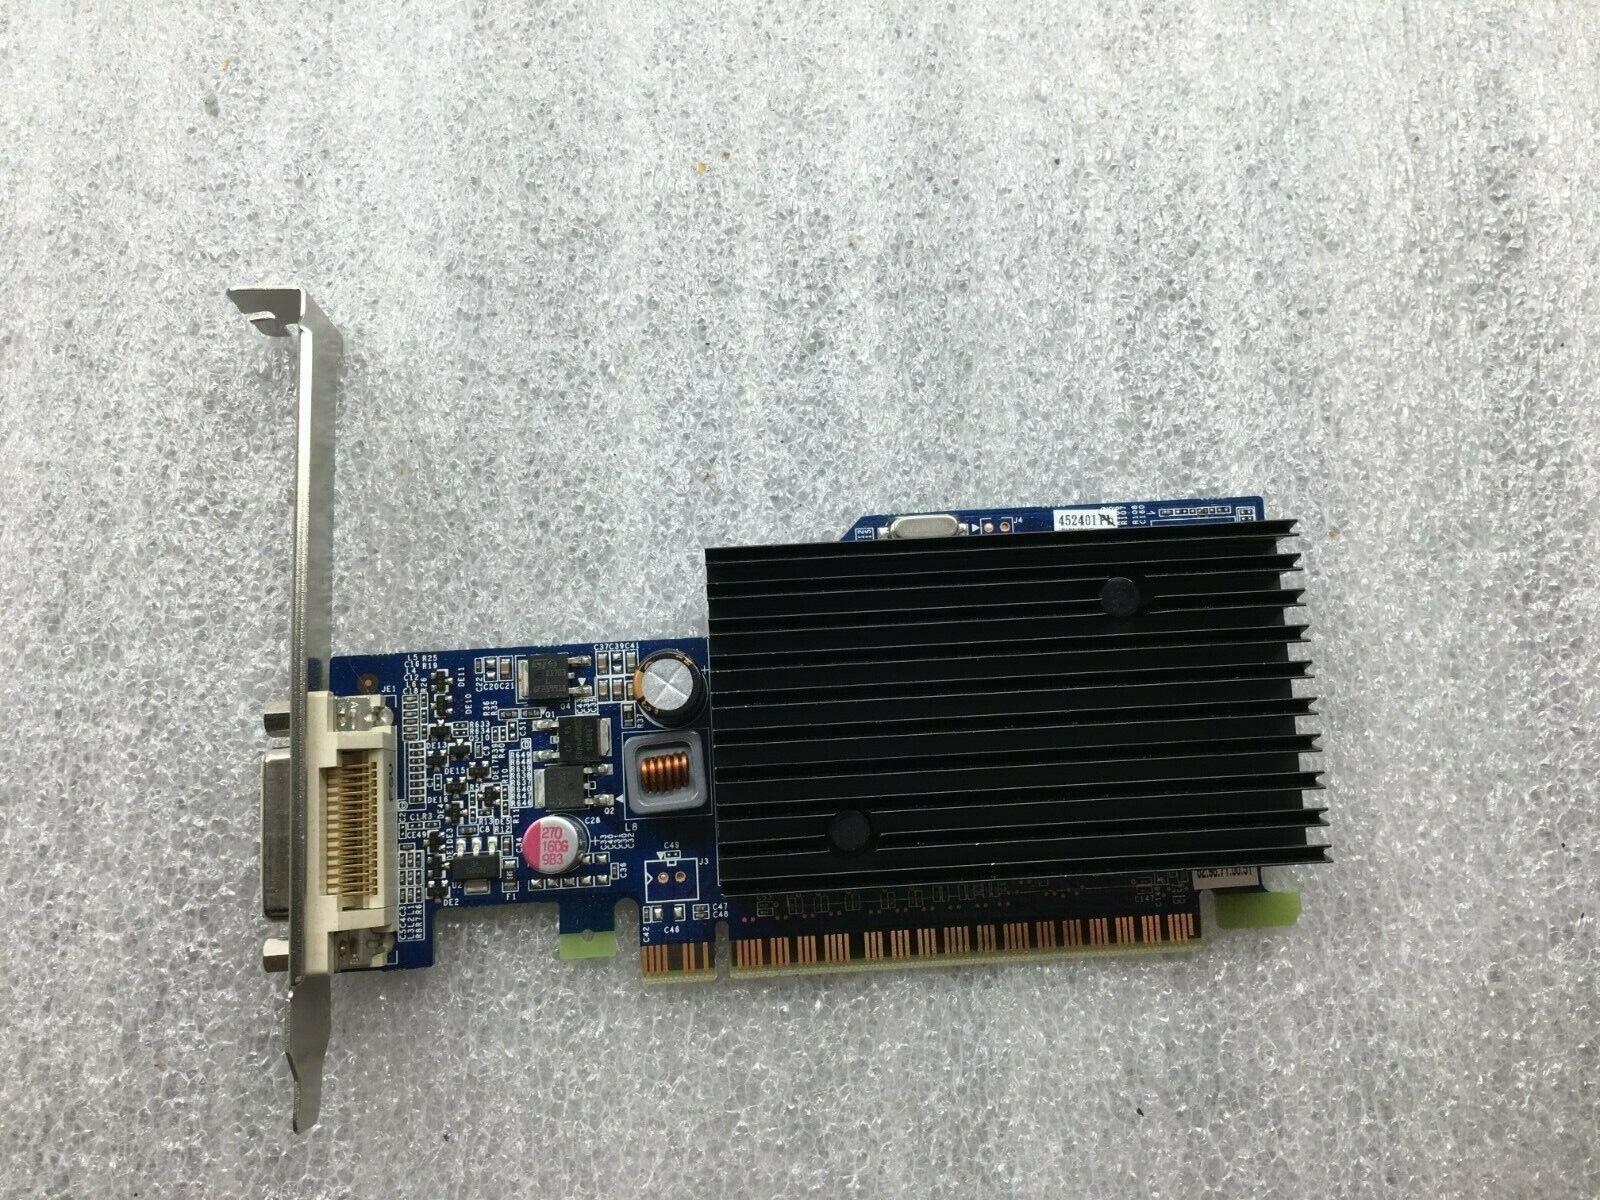 PNY GeForce 8400 GS DDR2 512 MB PCI 2.0 High Profile DVI Video Card /DMS 59 Port